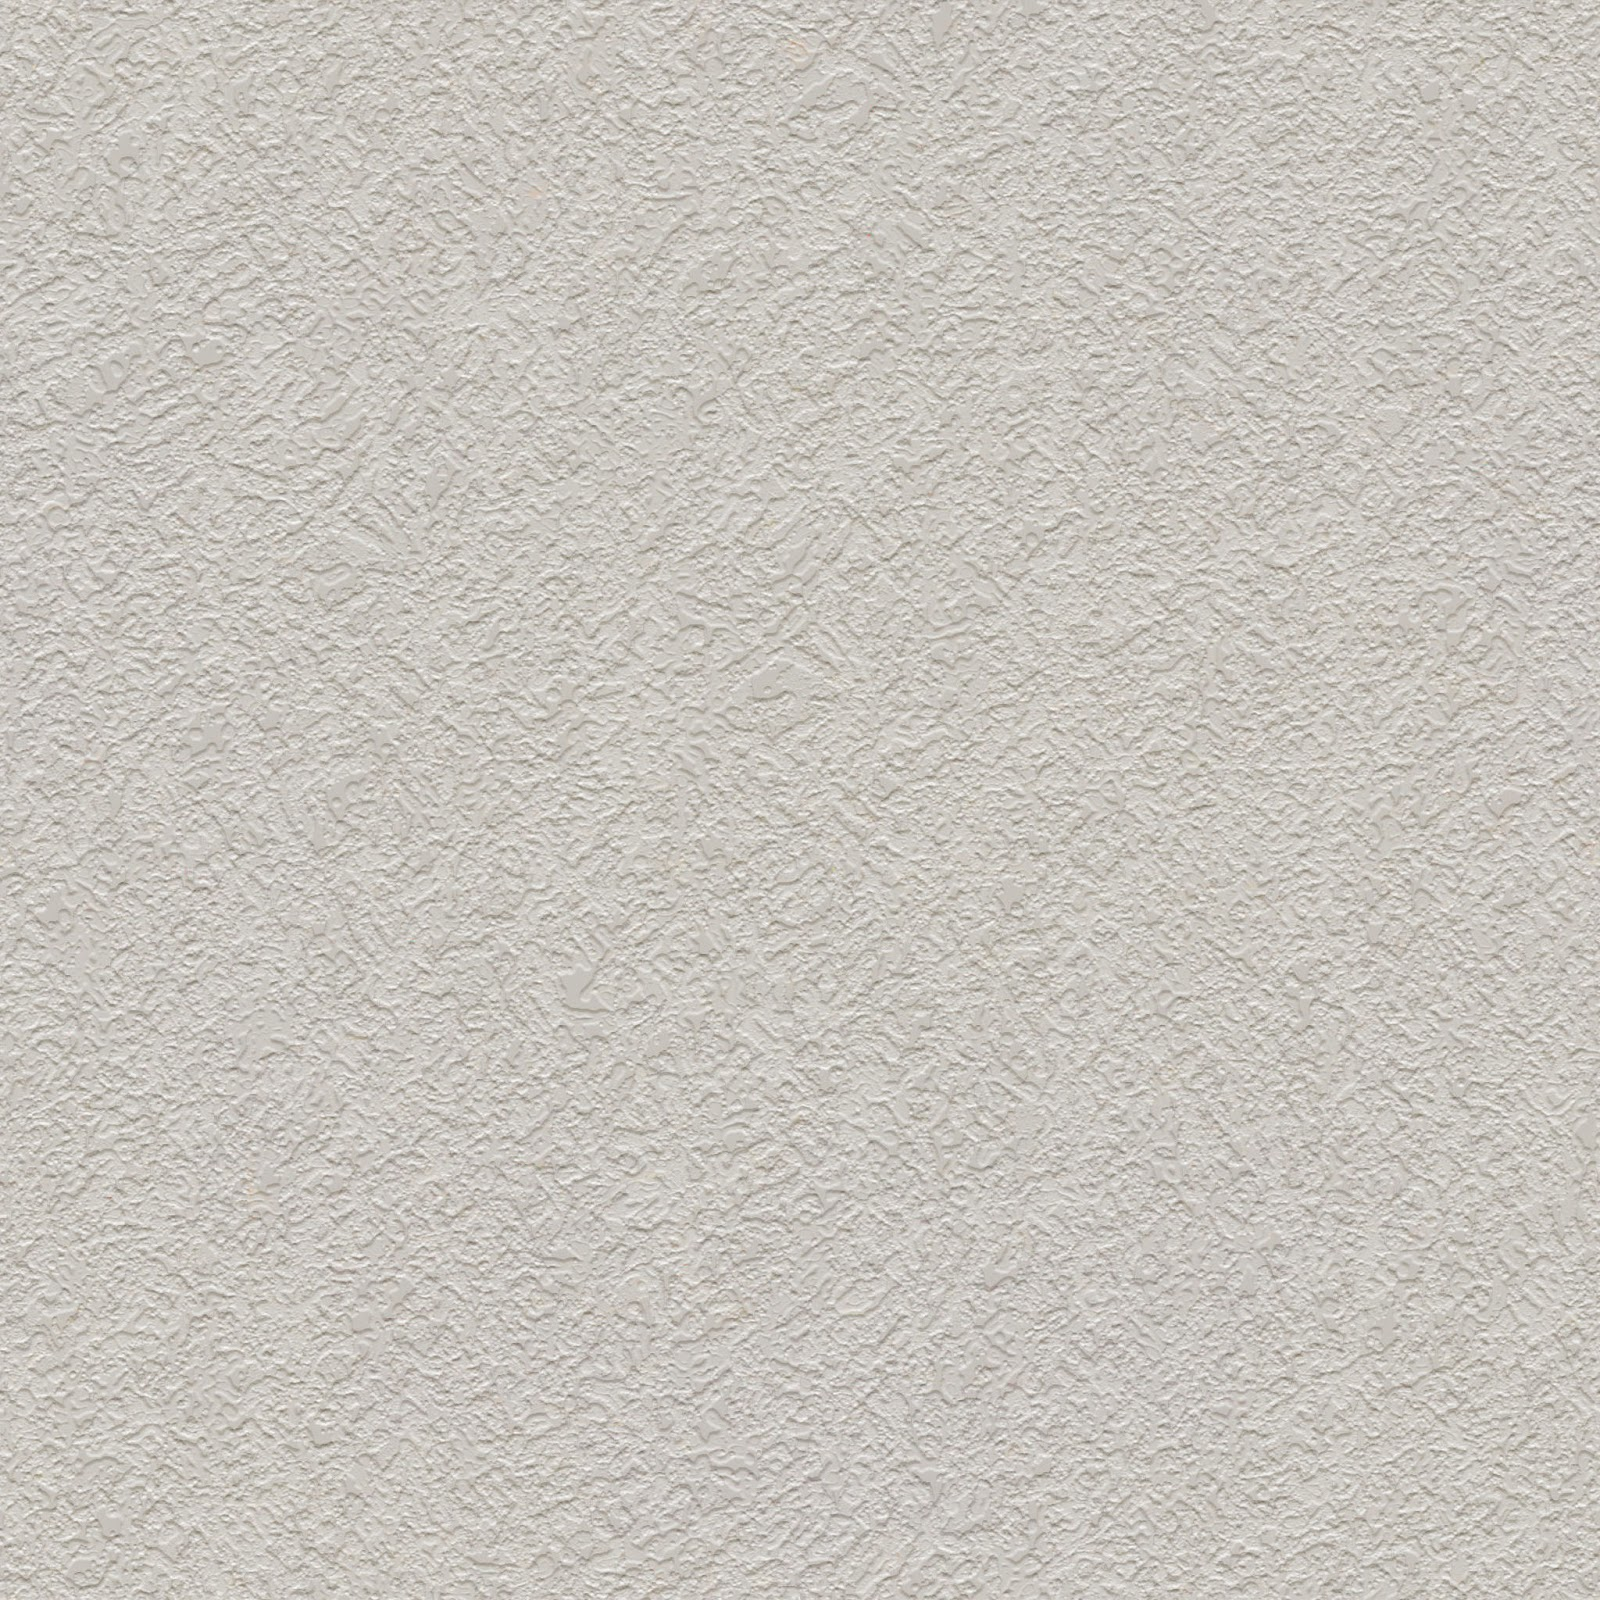 high resolution seamless textures stucco